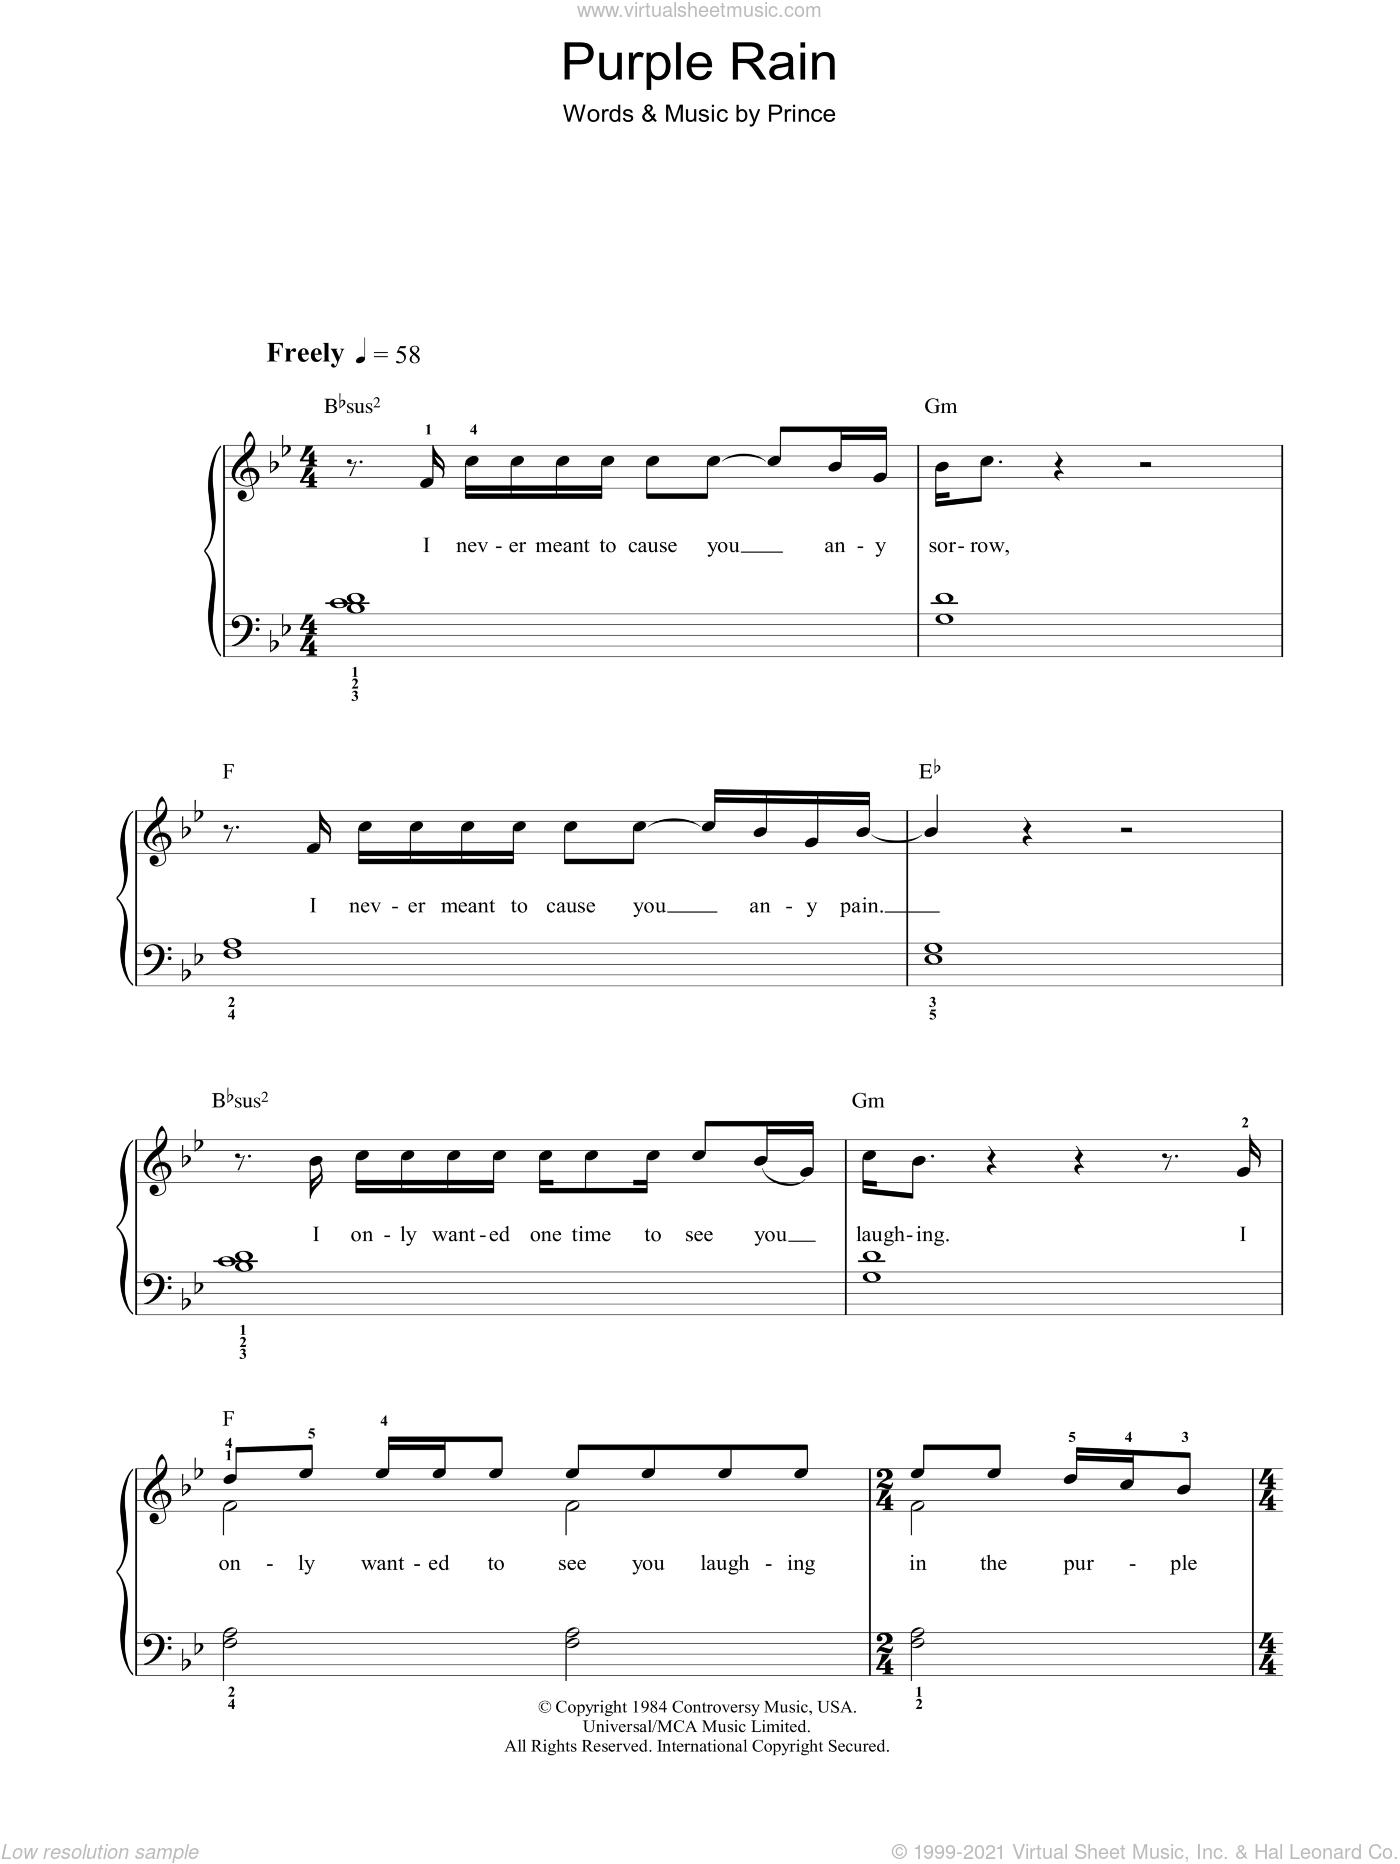 Prince - Purple Rain sheet music for piano solo [PDF]